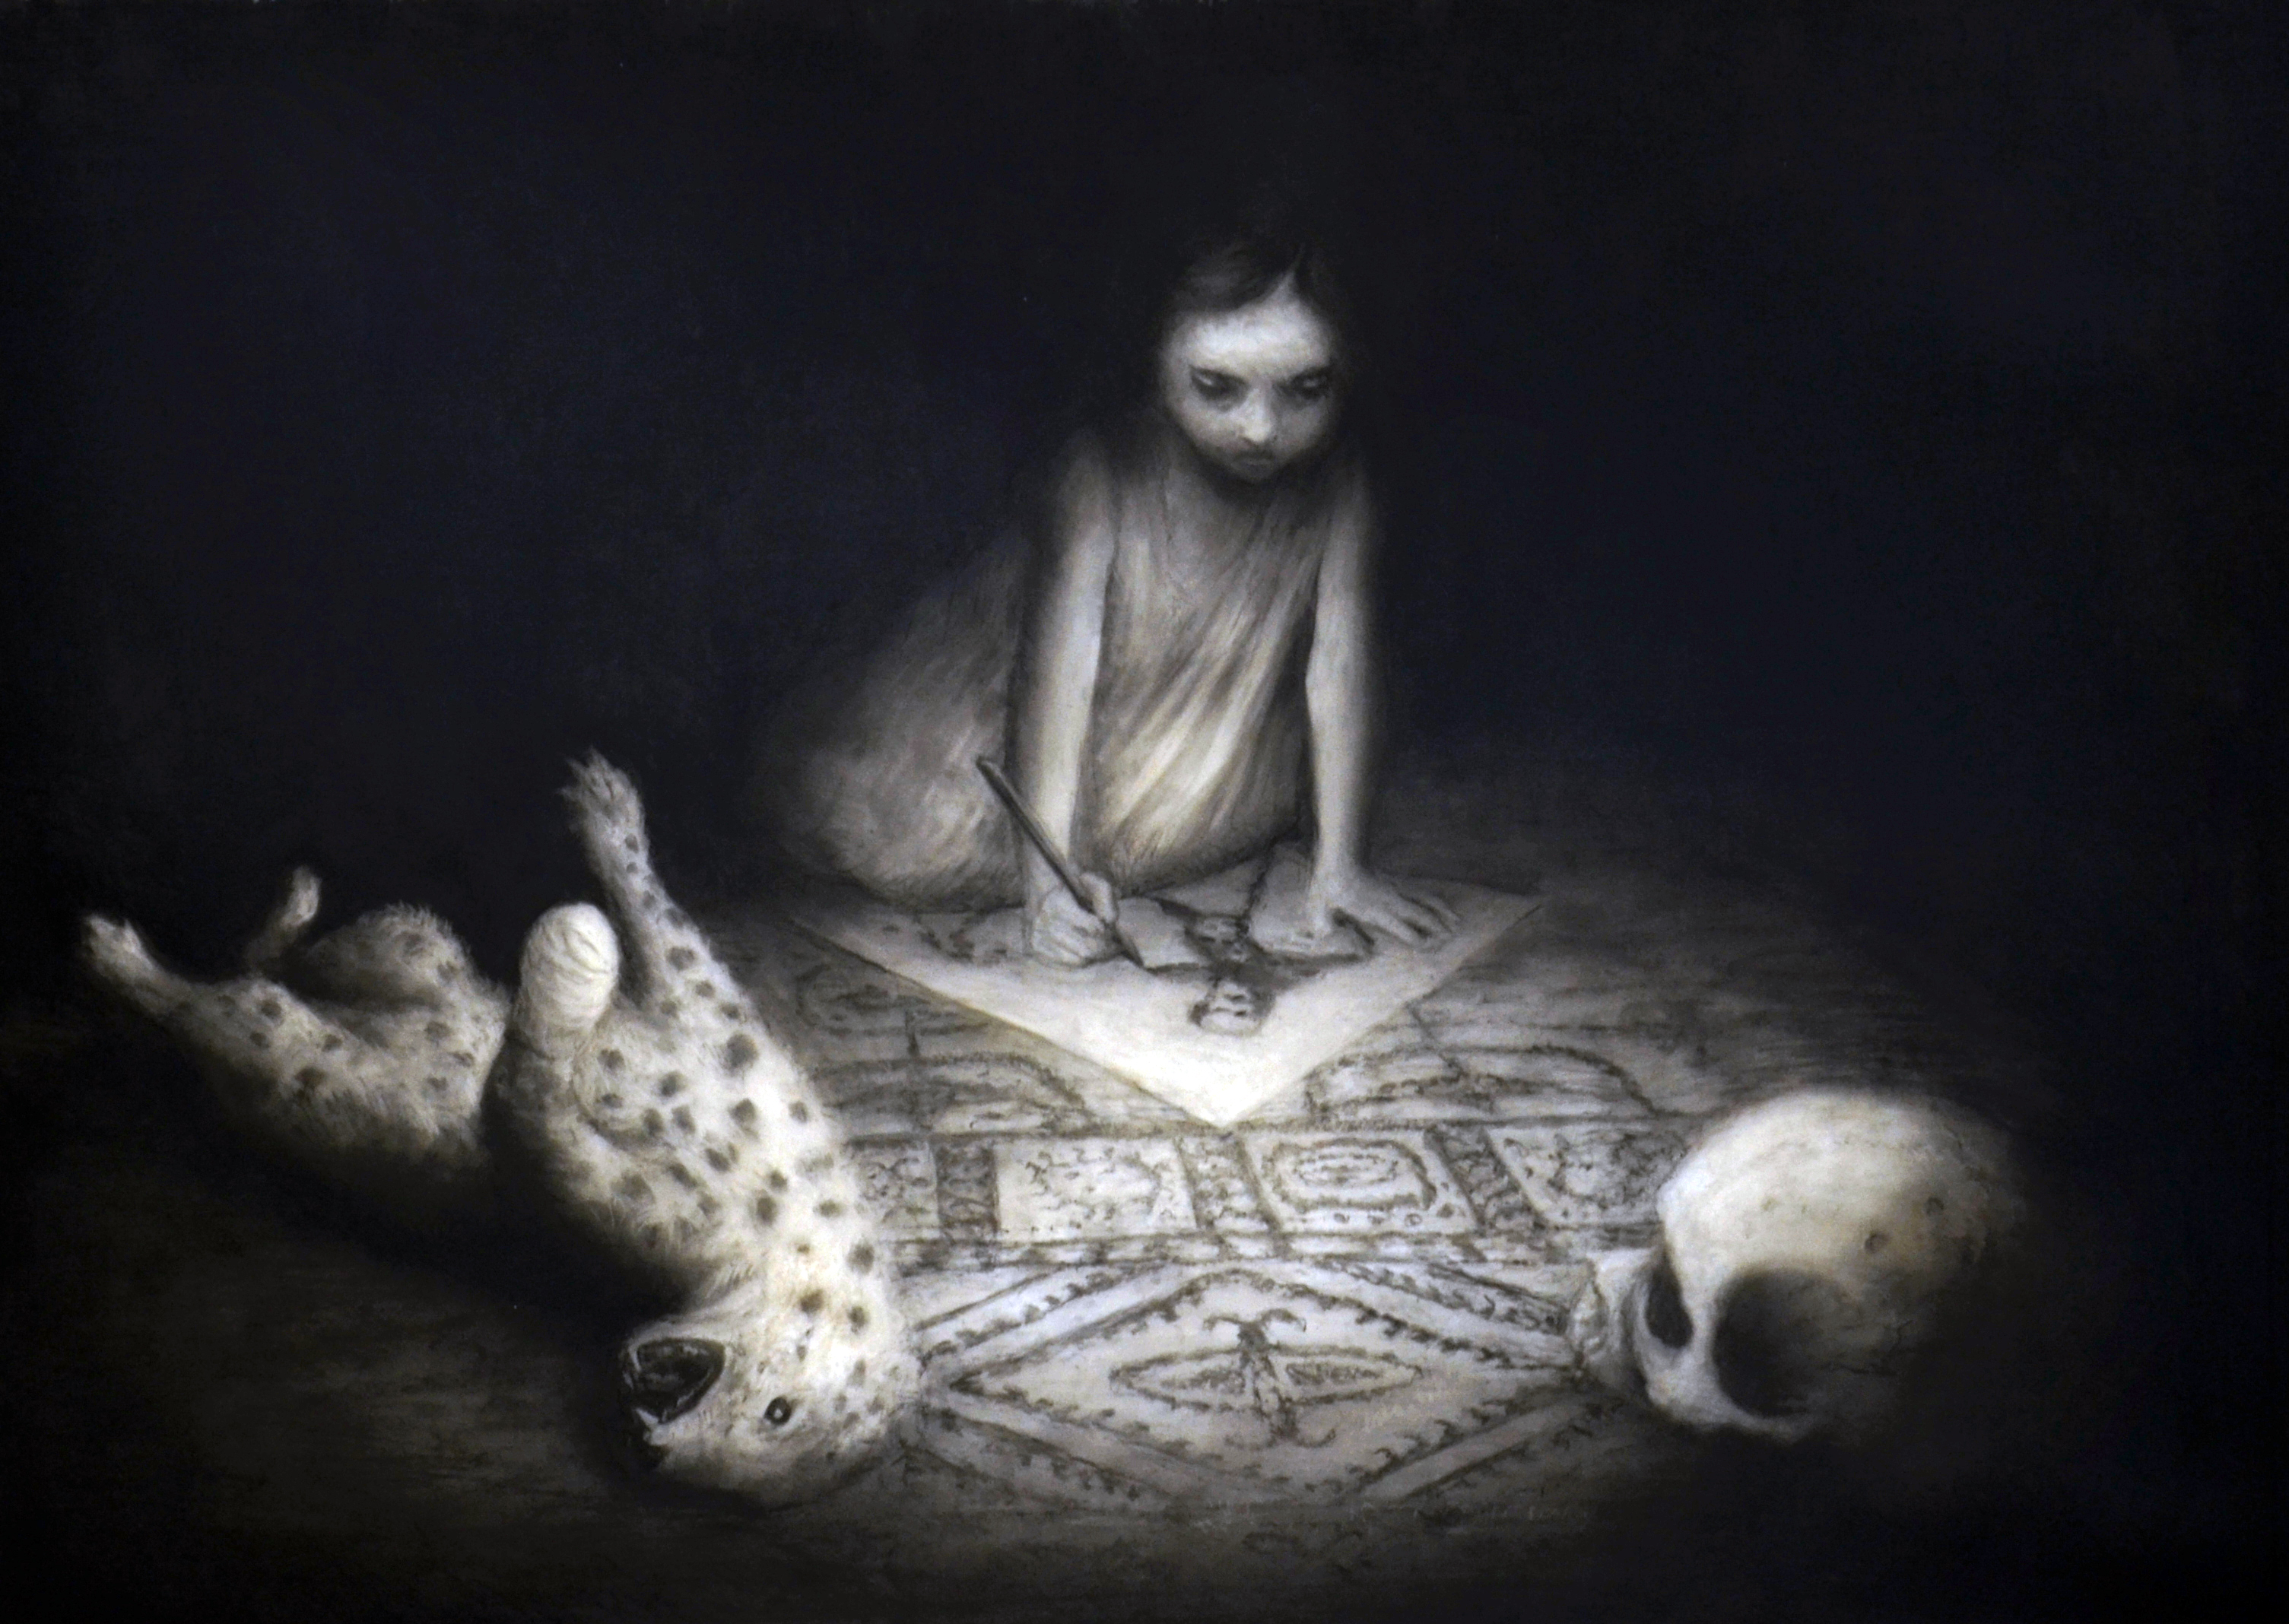 Victor-Soren-image de la nuit